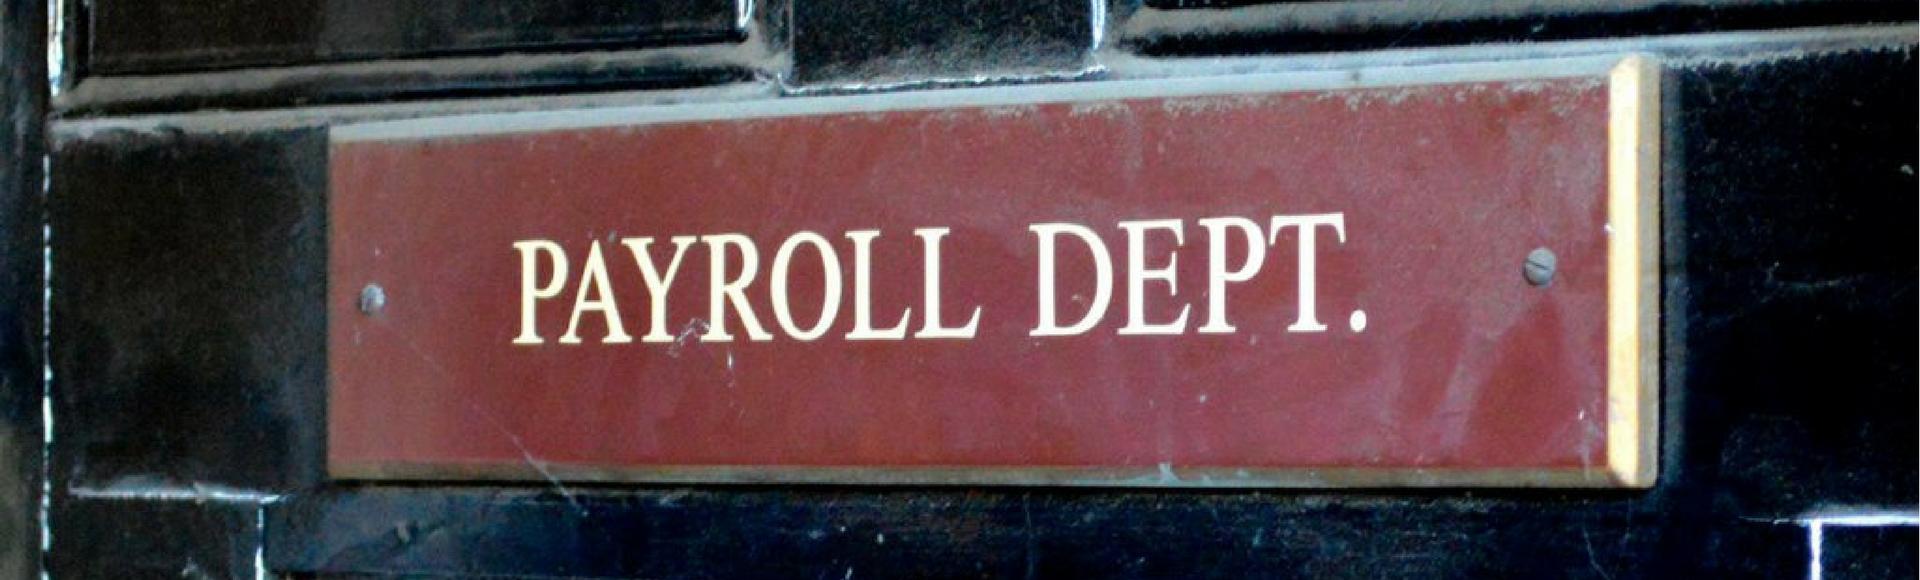 Payroll Debt